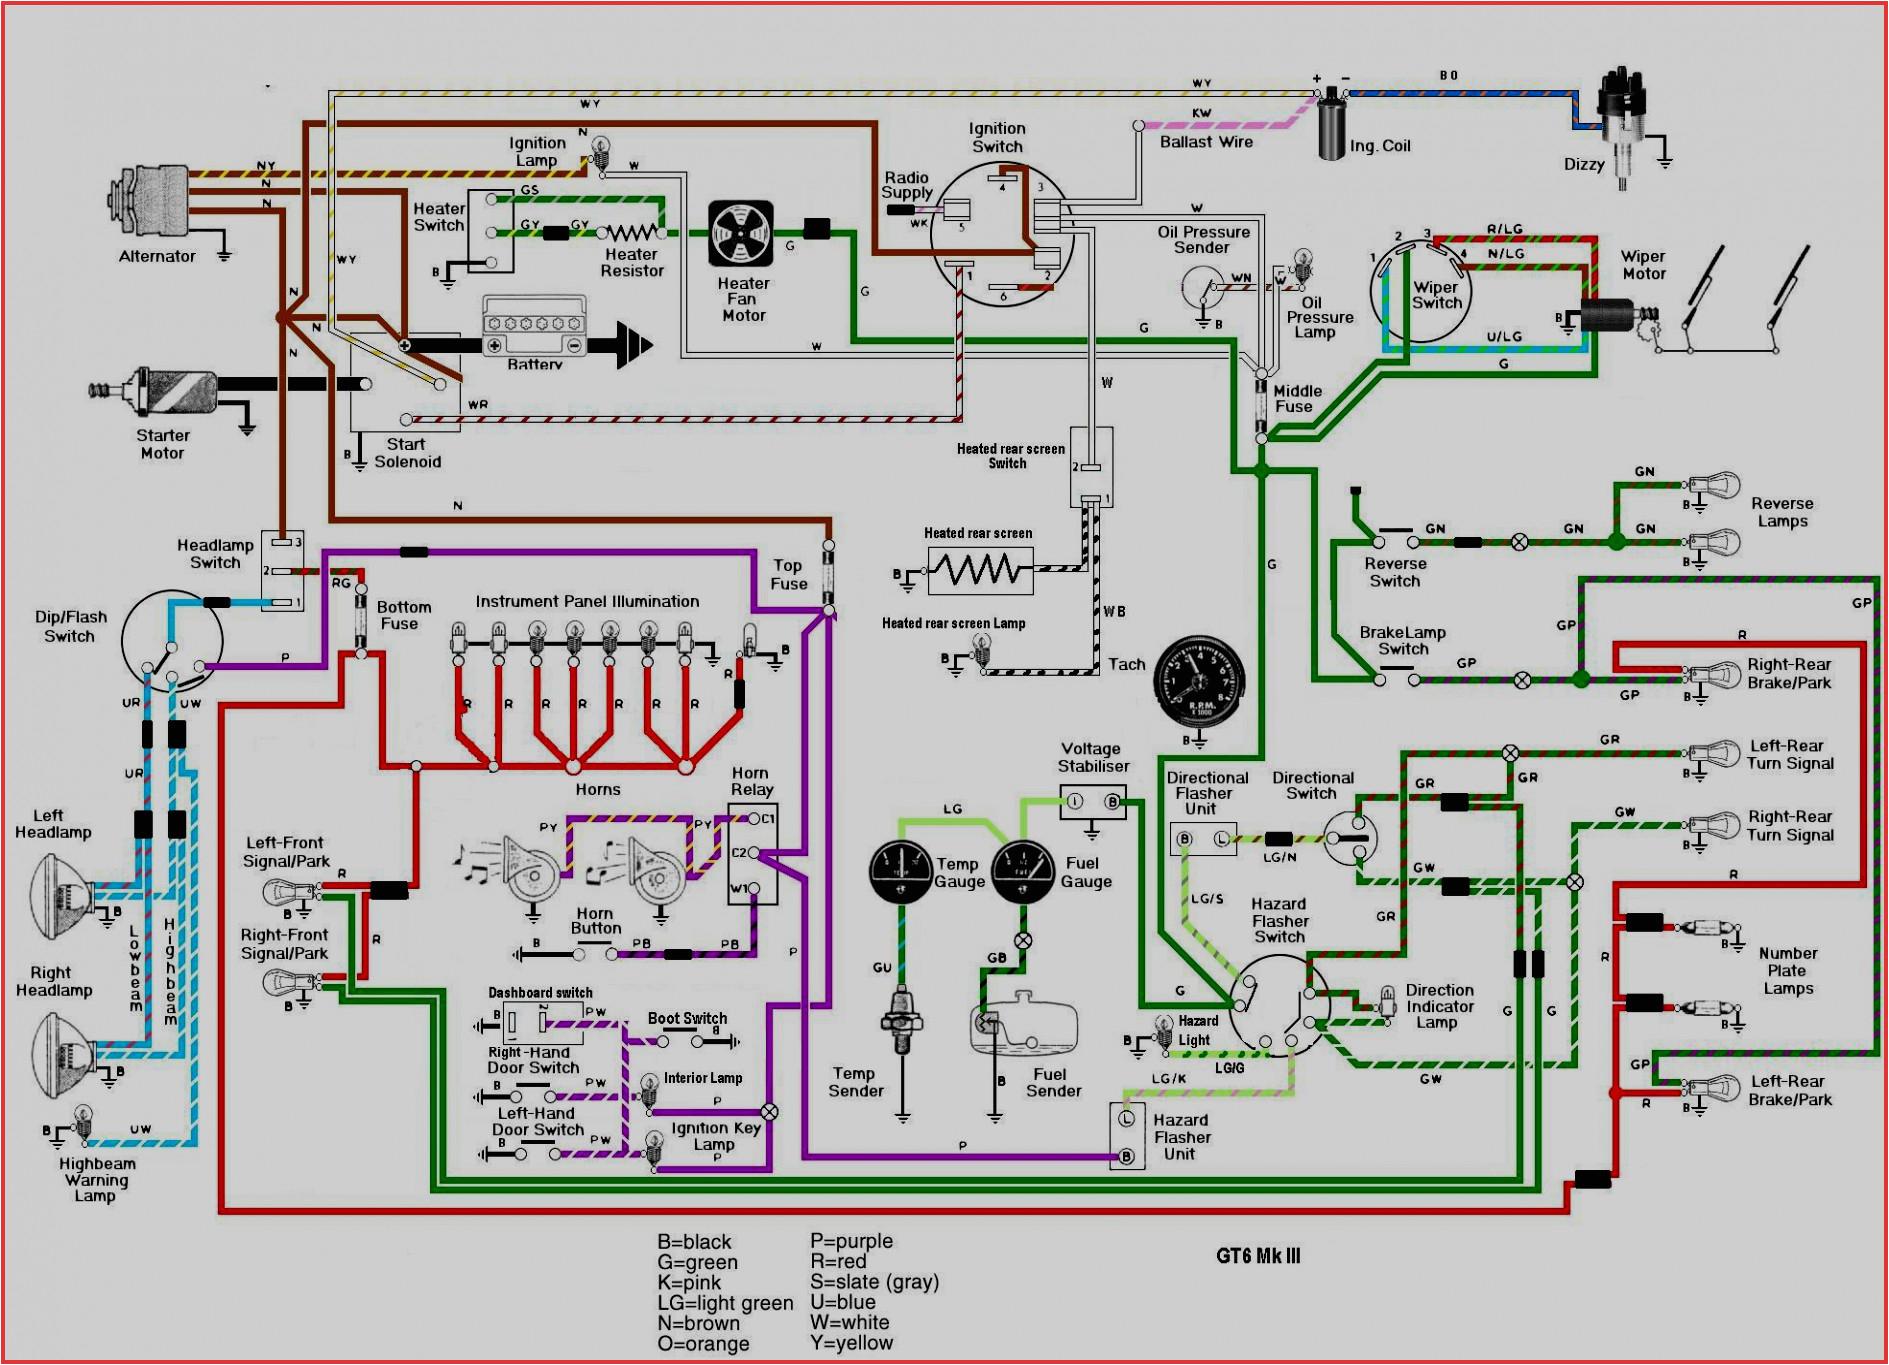 basic ignition wiring diagram 1979 mgb premium wiring diagram blog 1976 mgb electronic ignition system wiring diagram